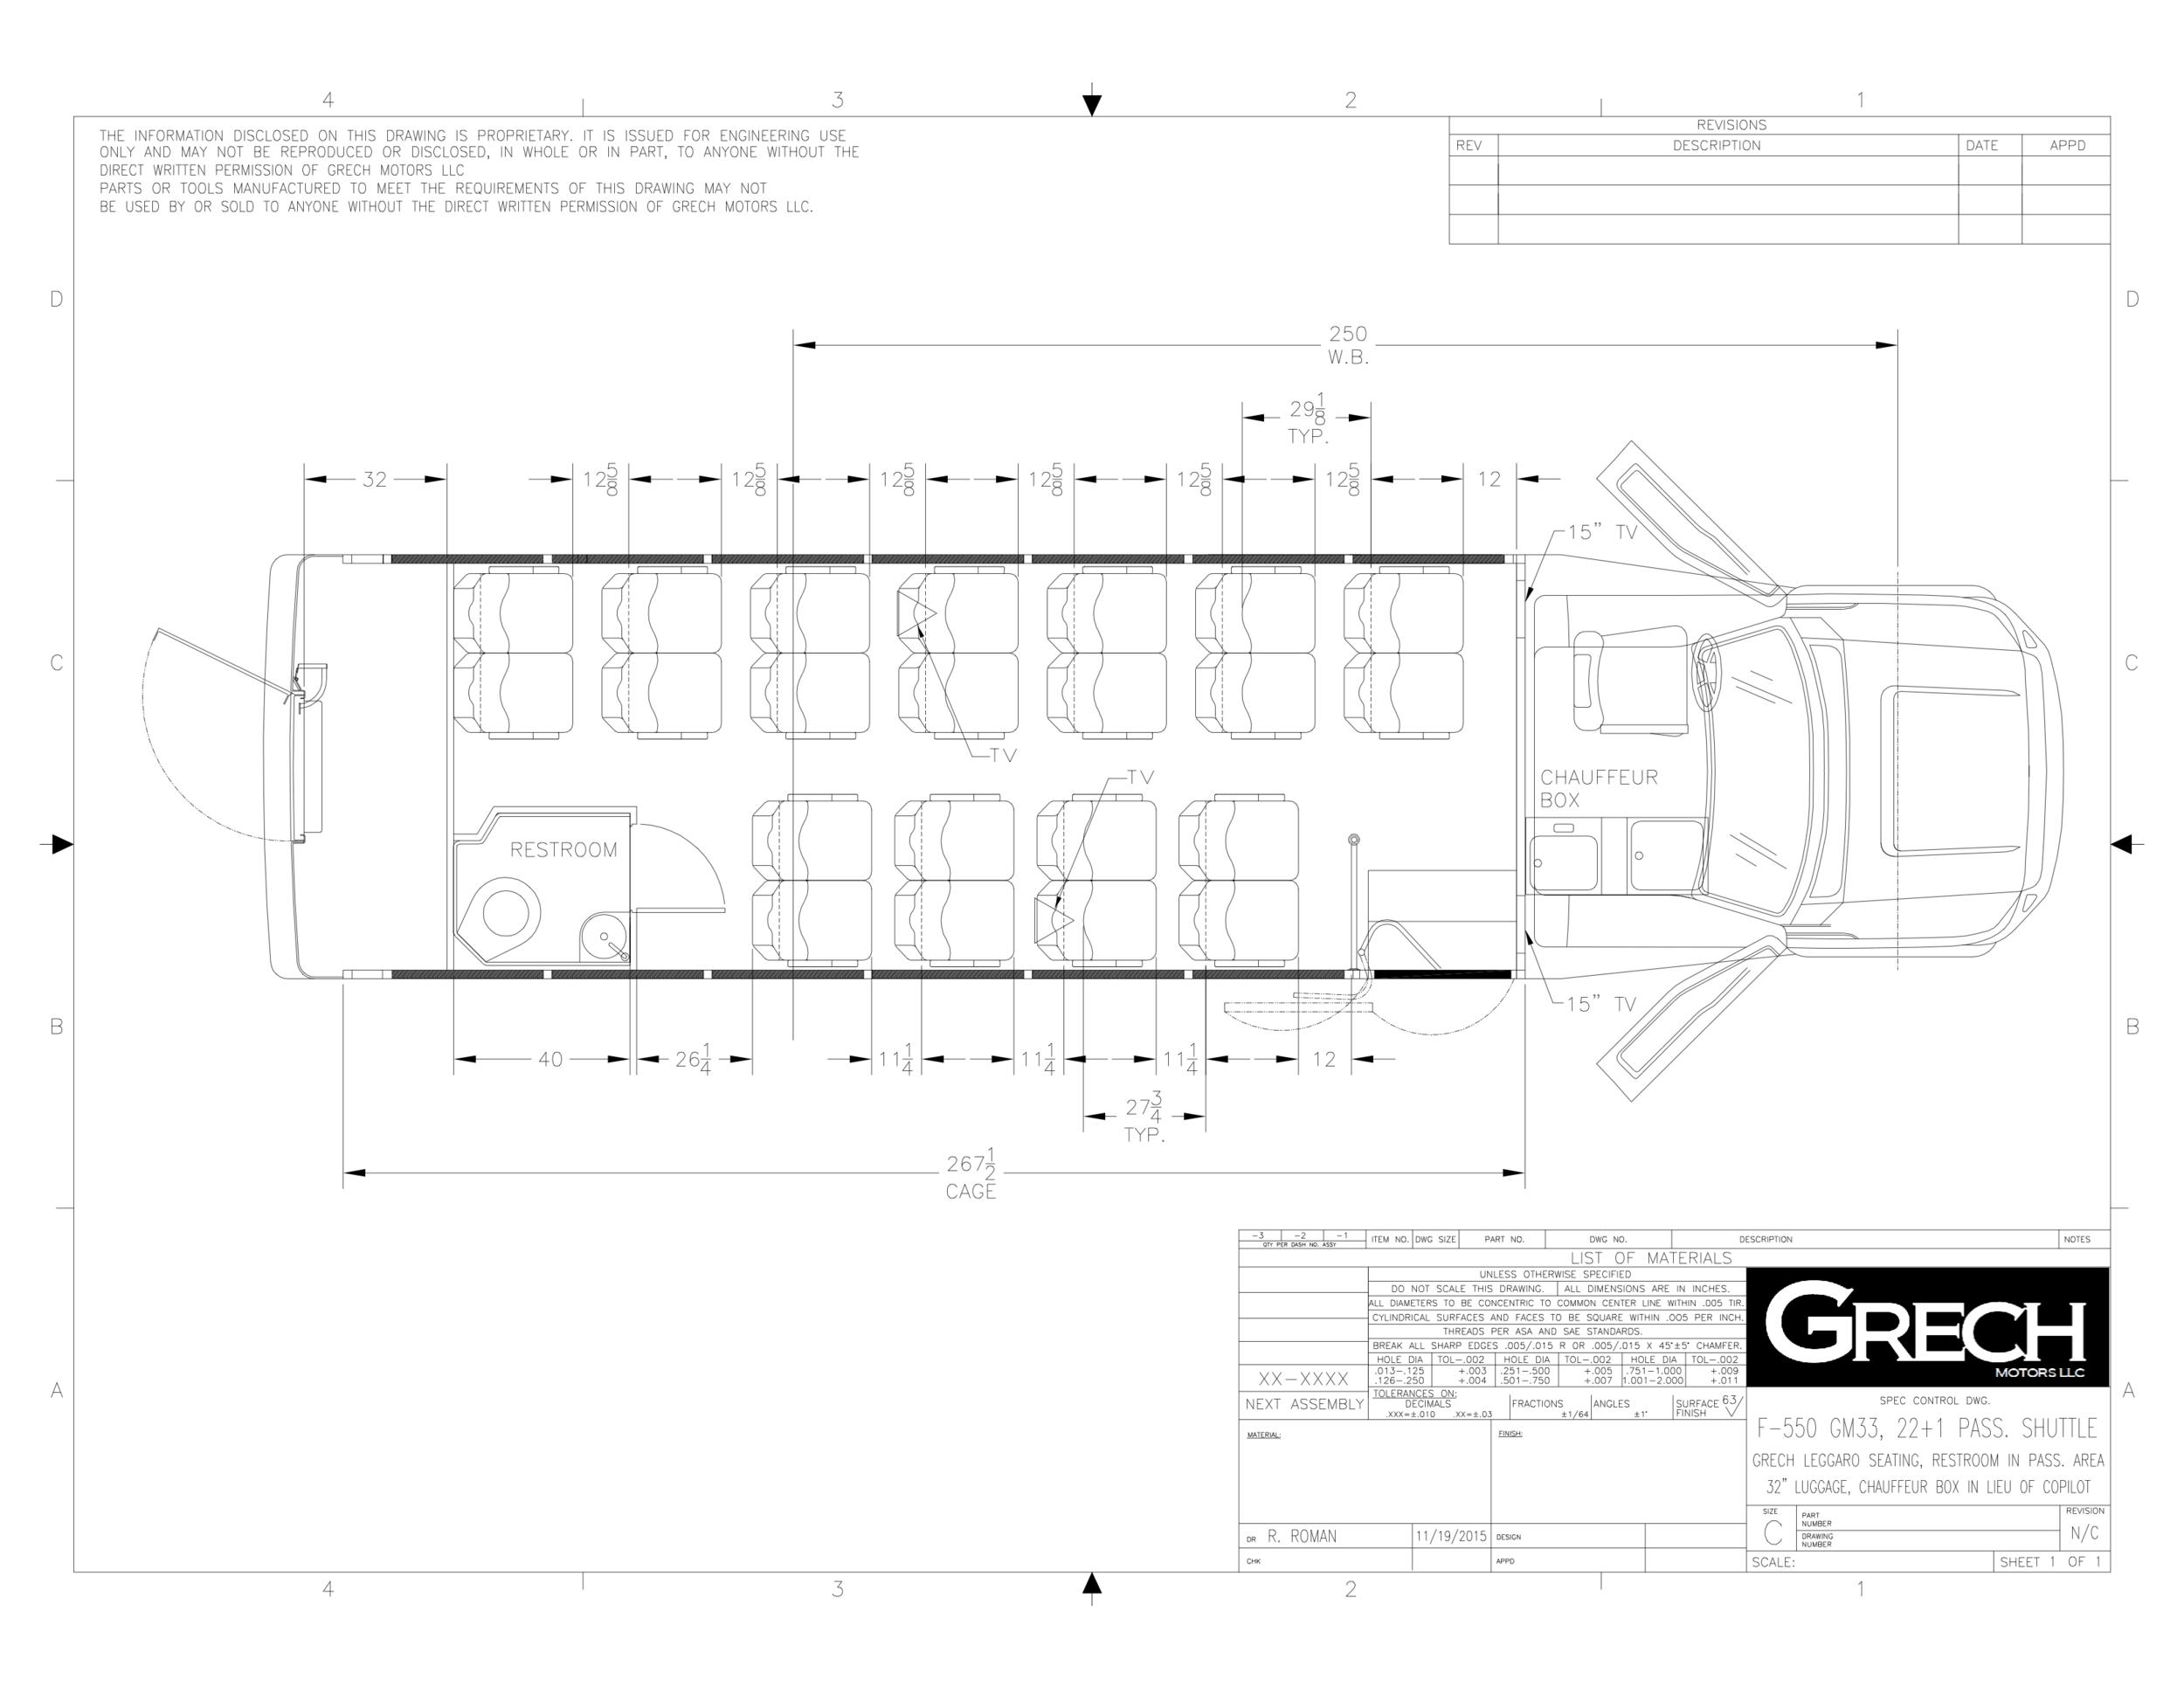 F-550 GM33 22+1, Grech Leggaro Seating, Restroom In Pass. Area, 32in Lug., Chauffeur Box In Lieu Of Copilot